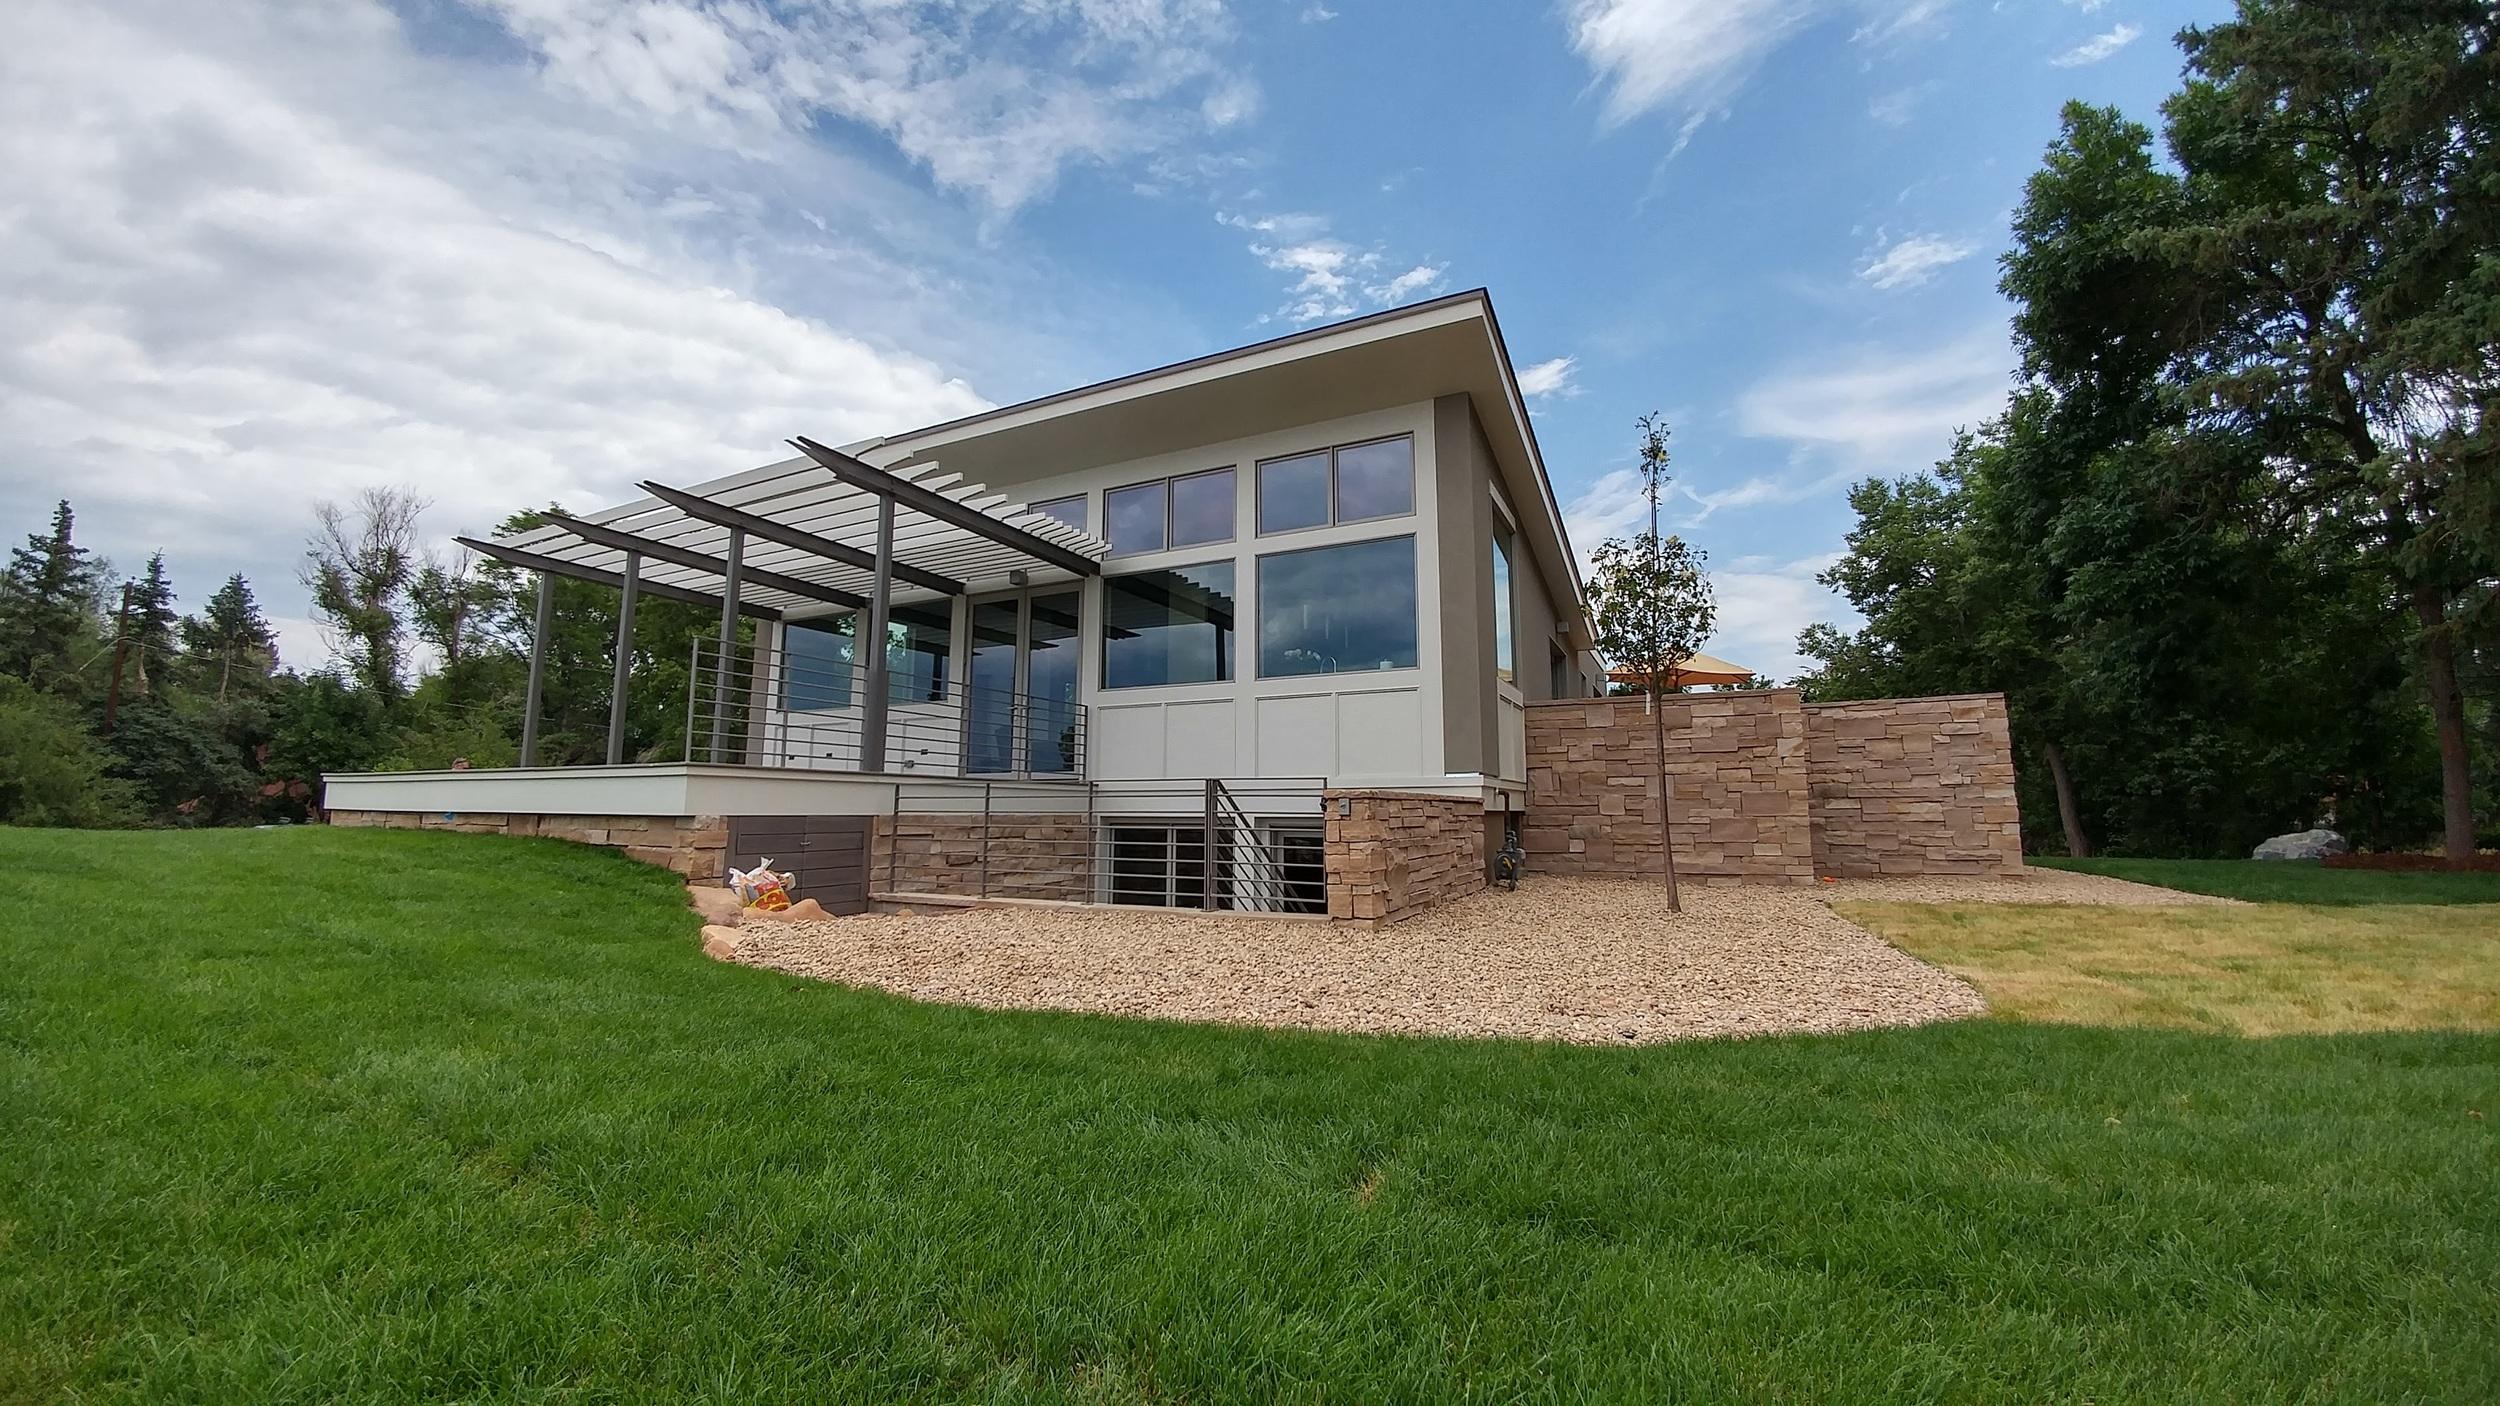 S. Cherryvale Residence